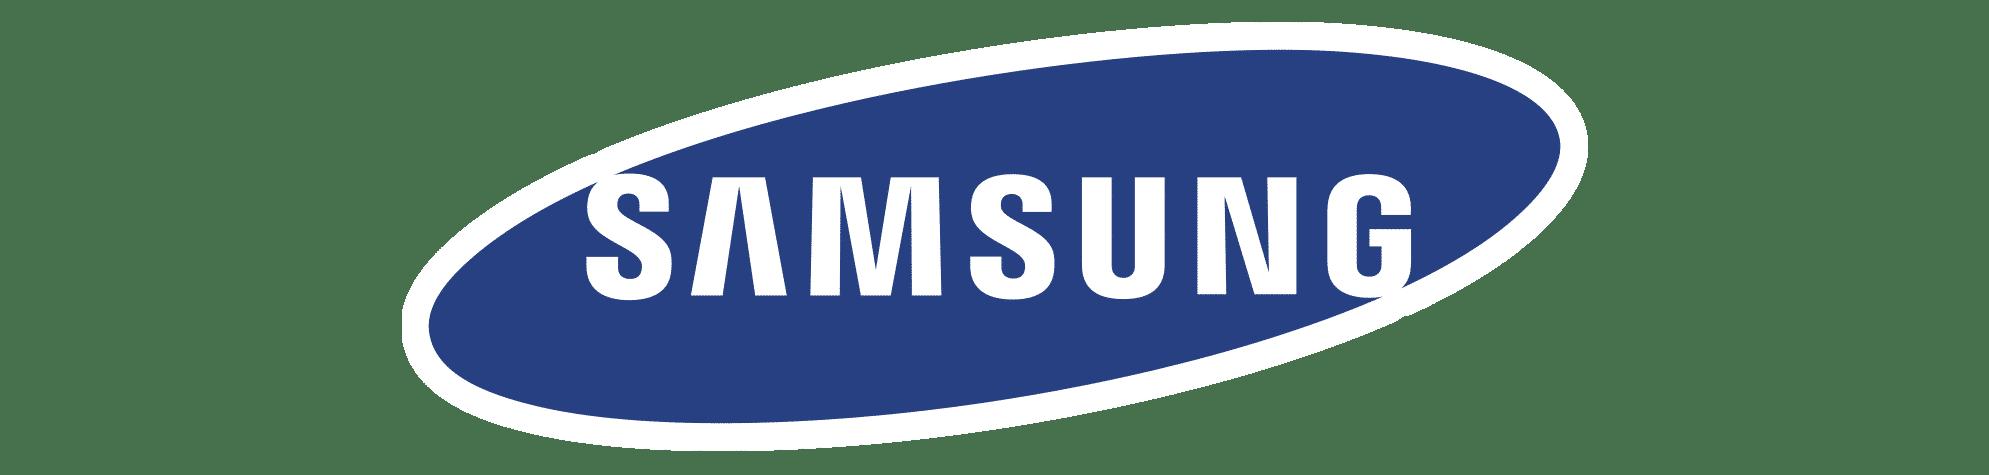 samsung-rouen-ps-energie